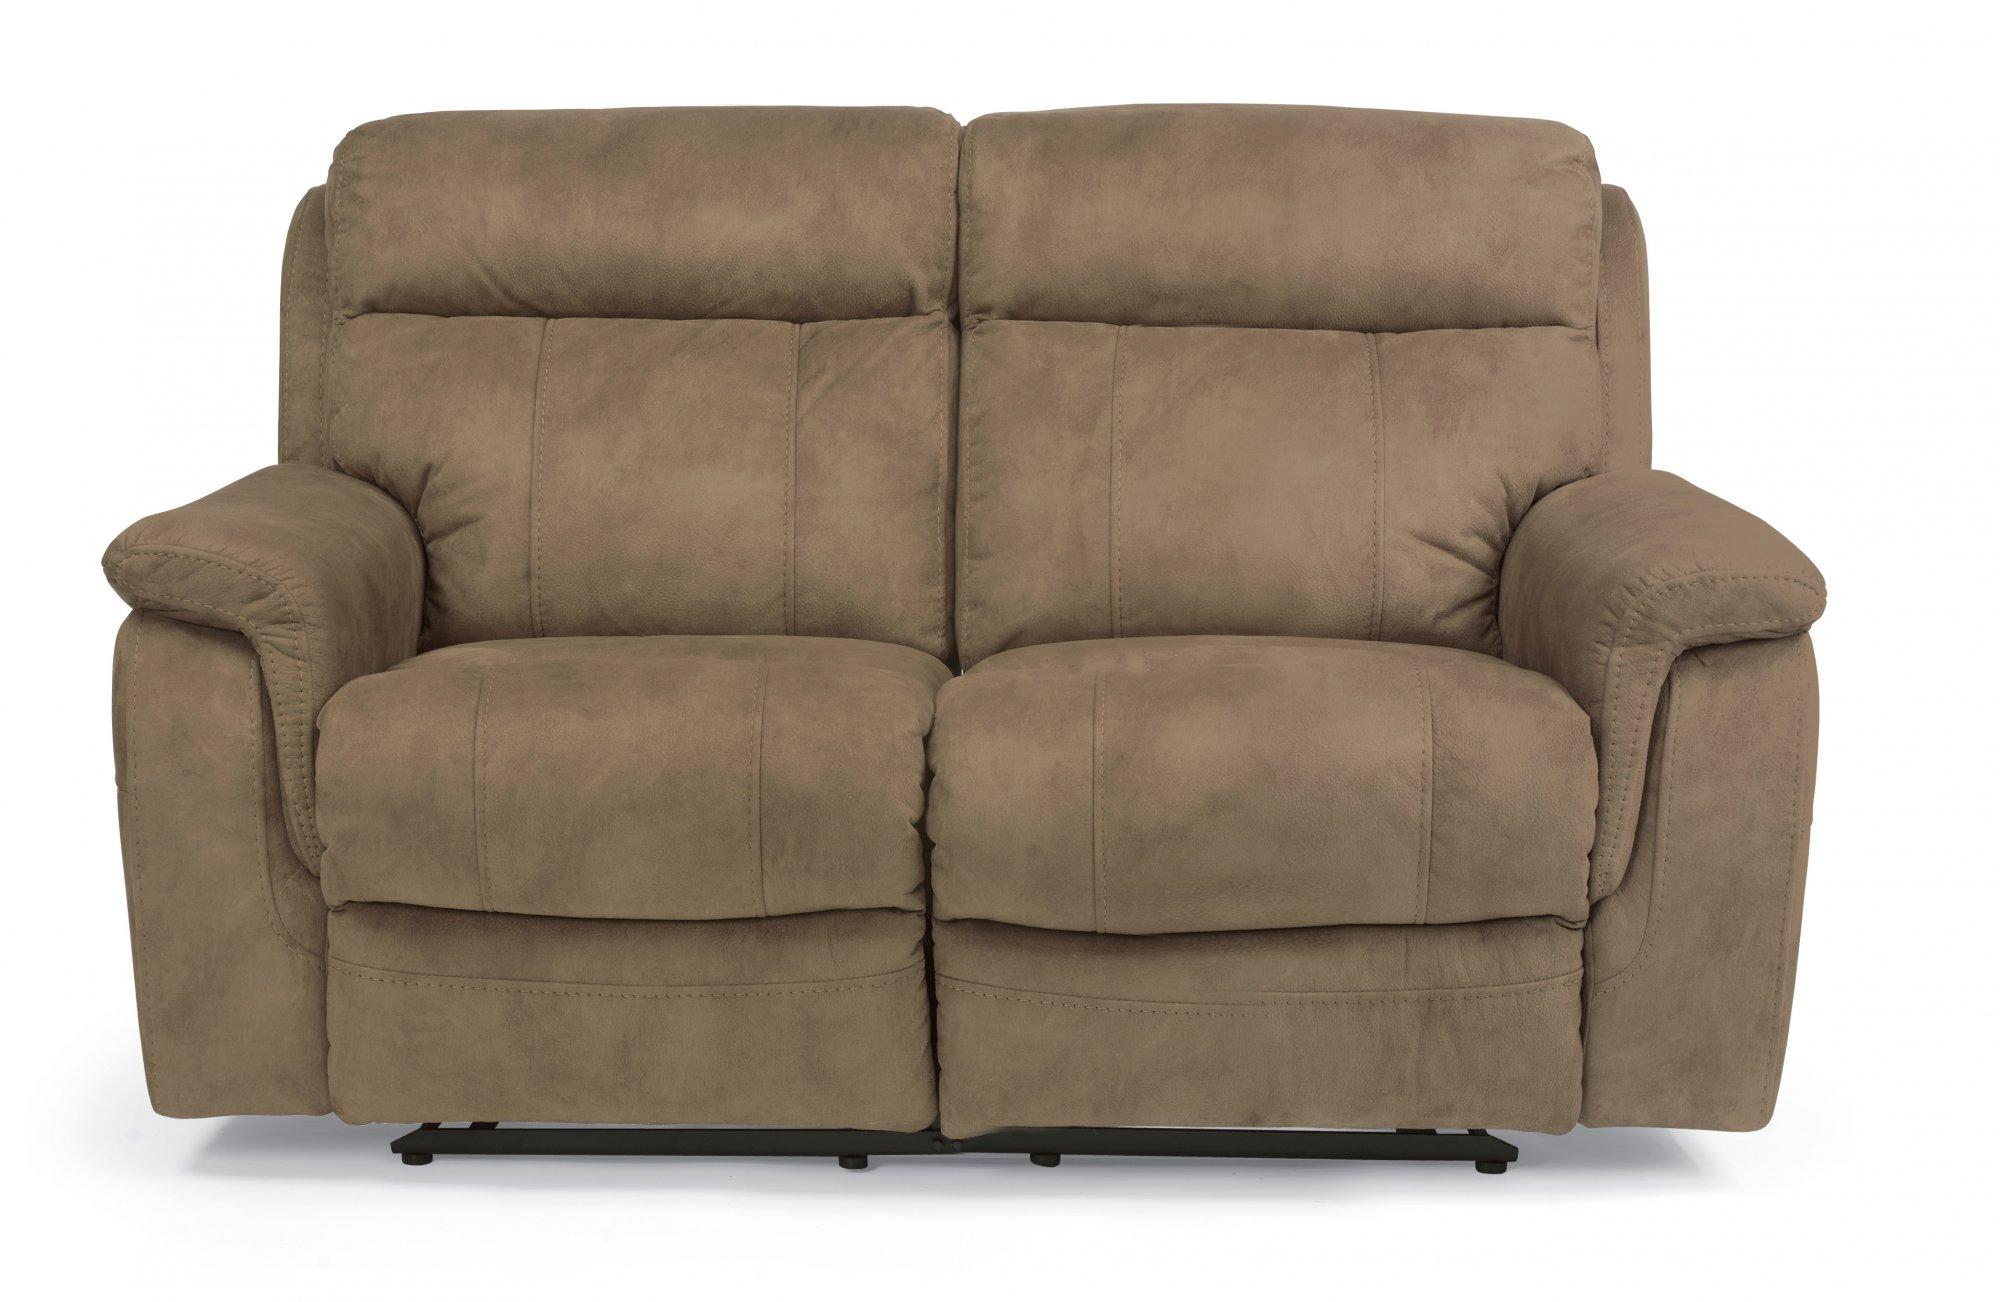 Outstanding Flexsteel 1425 60 Casino Fabric Reclining Loveseat Andrewgaddart Wooden Chair Designs For Living Room Andrewgaddartcom